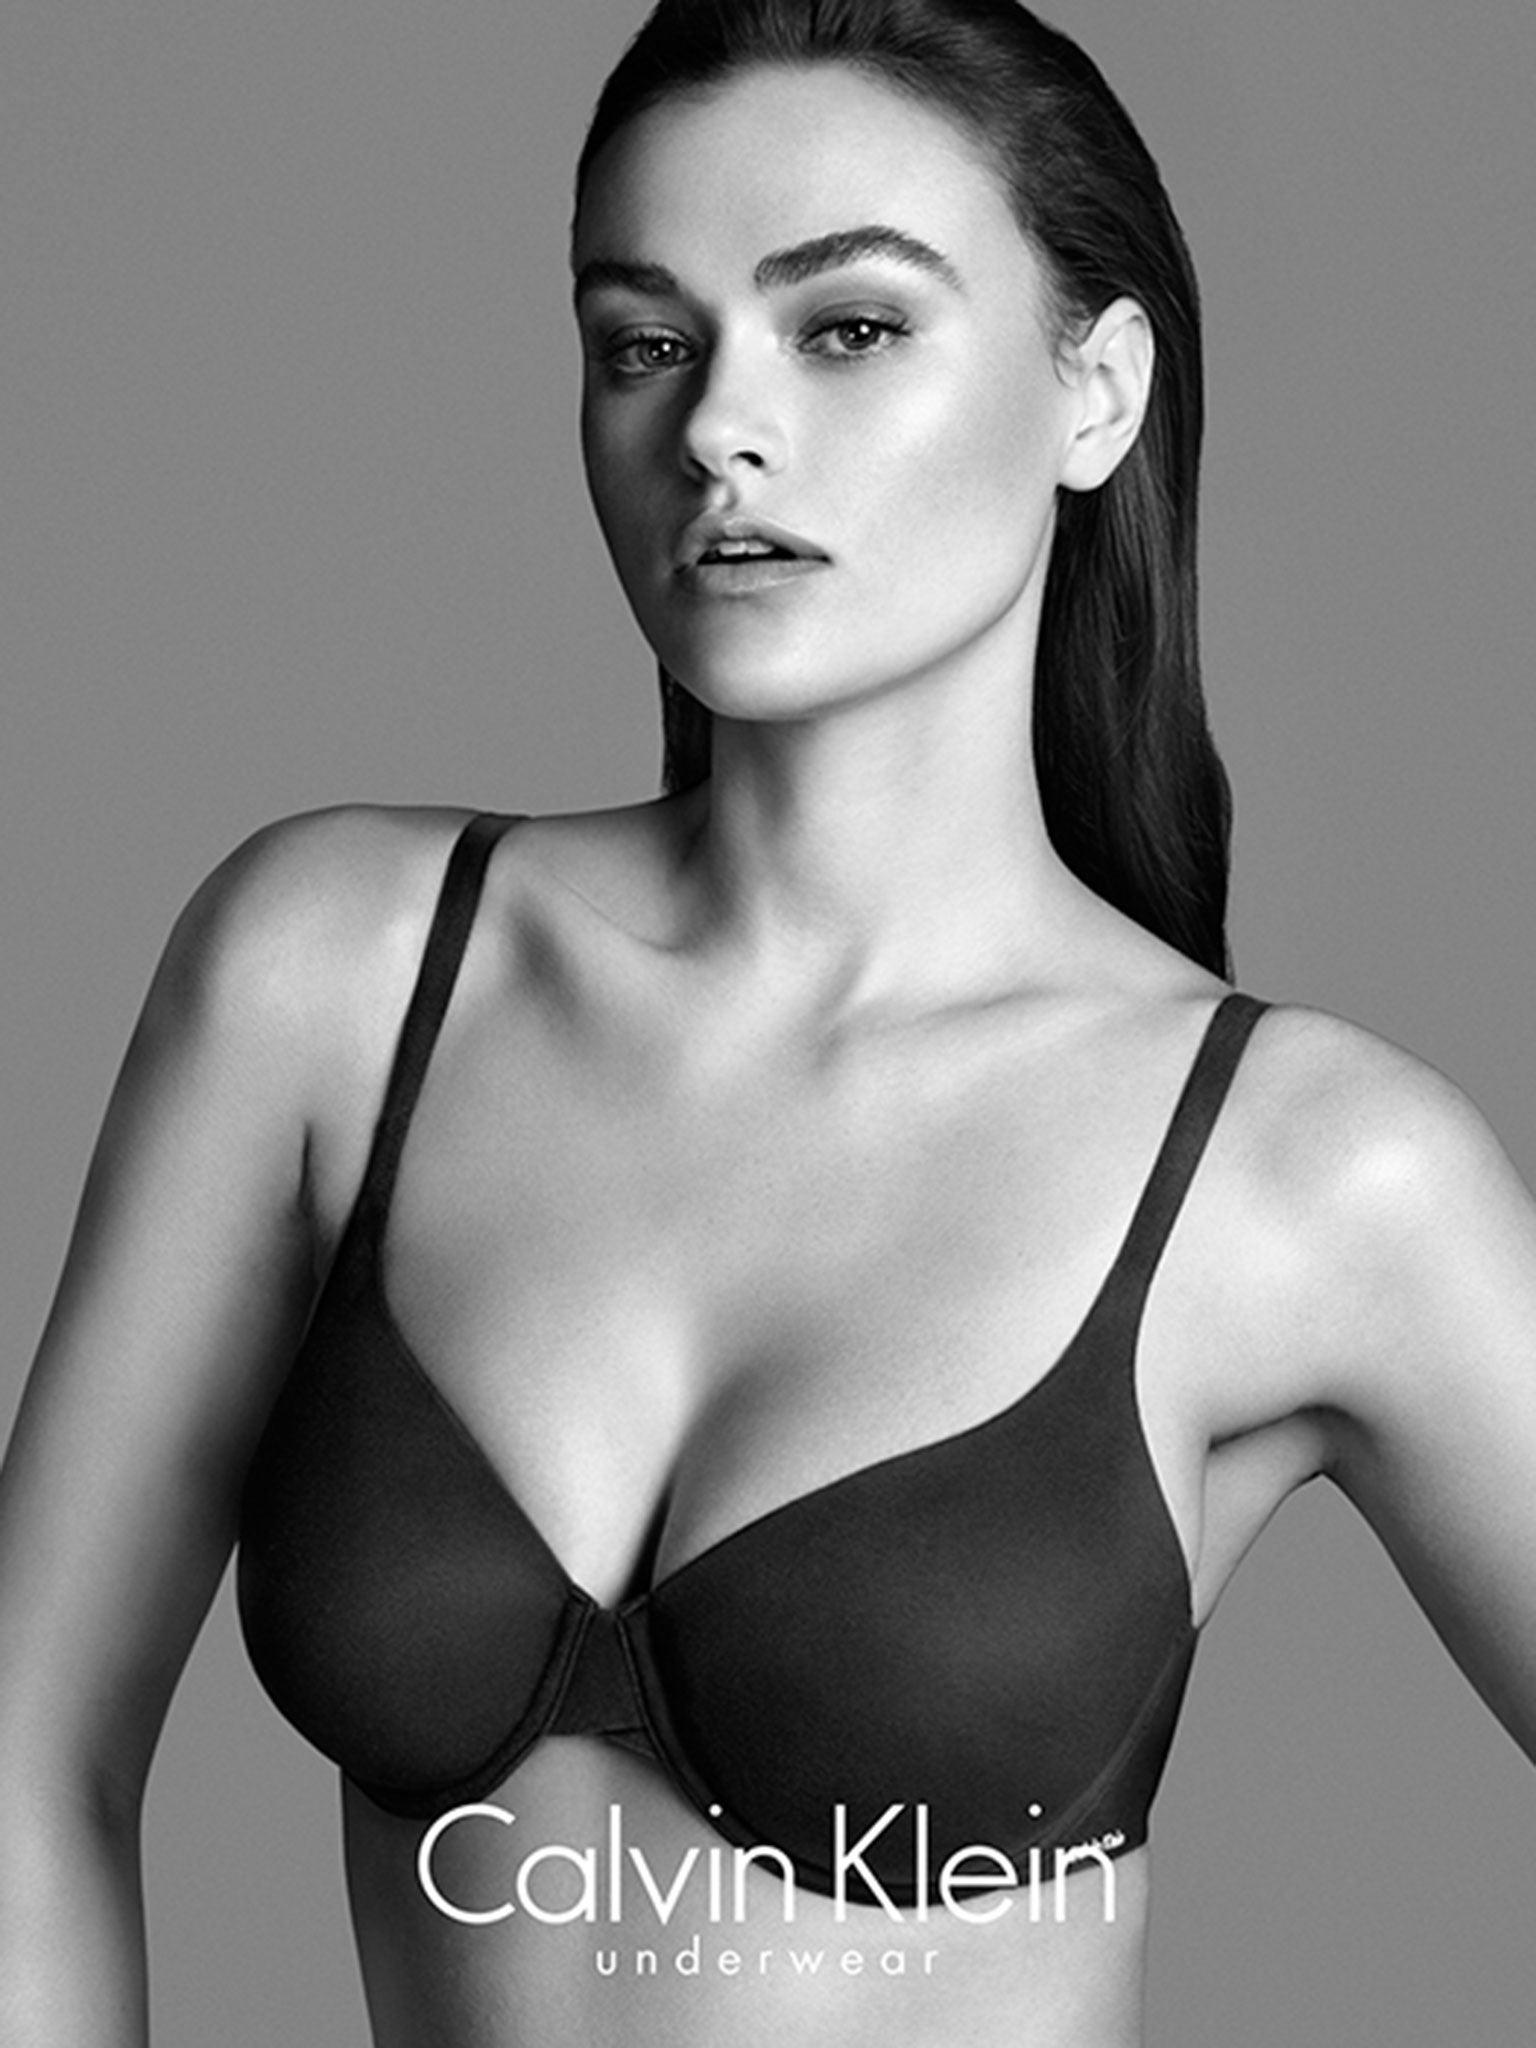 Myla Dalbesio Myla Dalbesio Interview with Calvin Klein model sparks